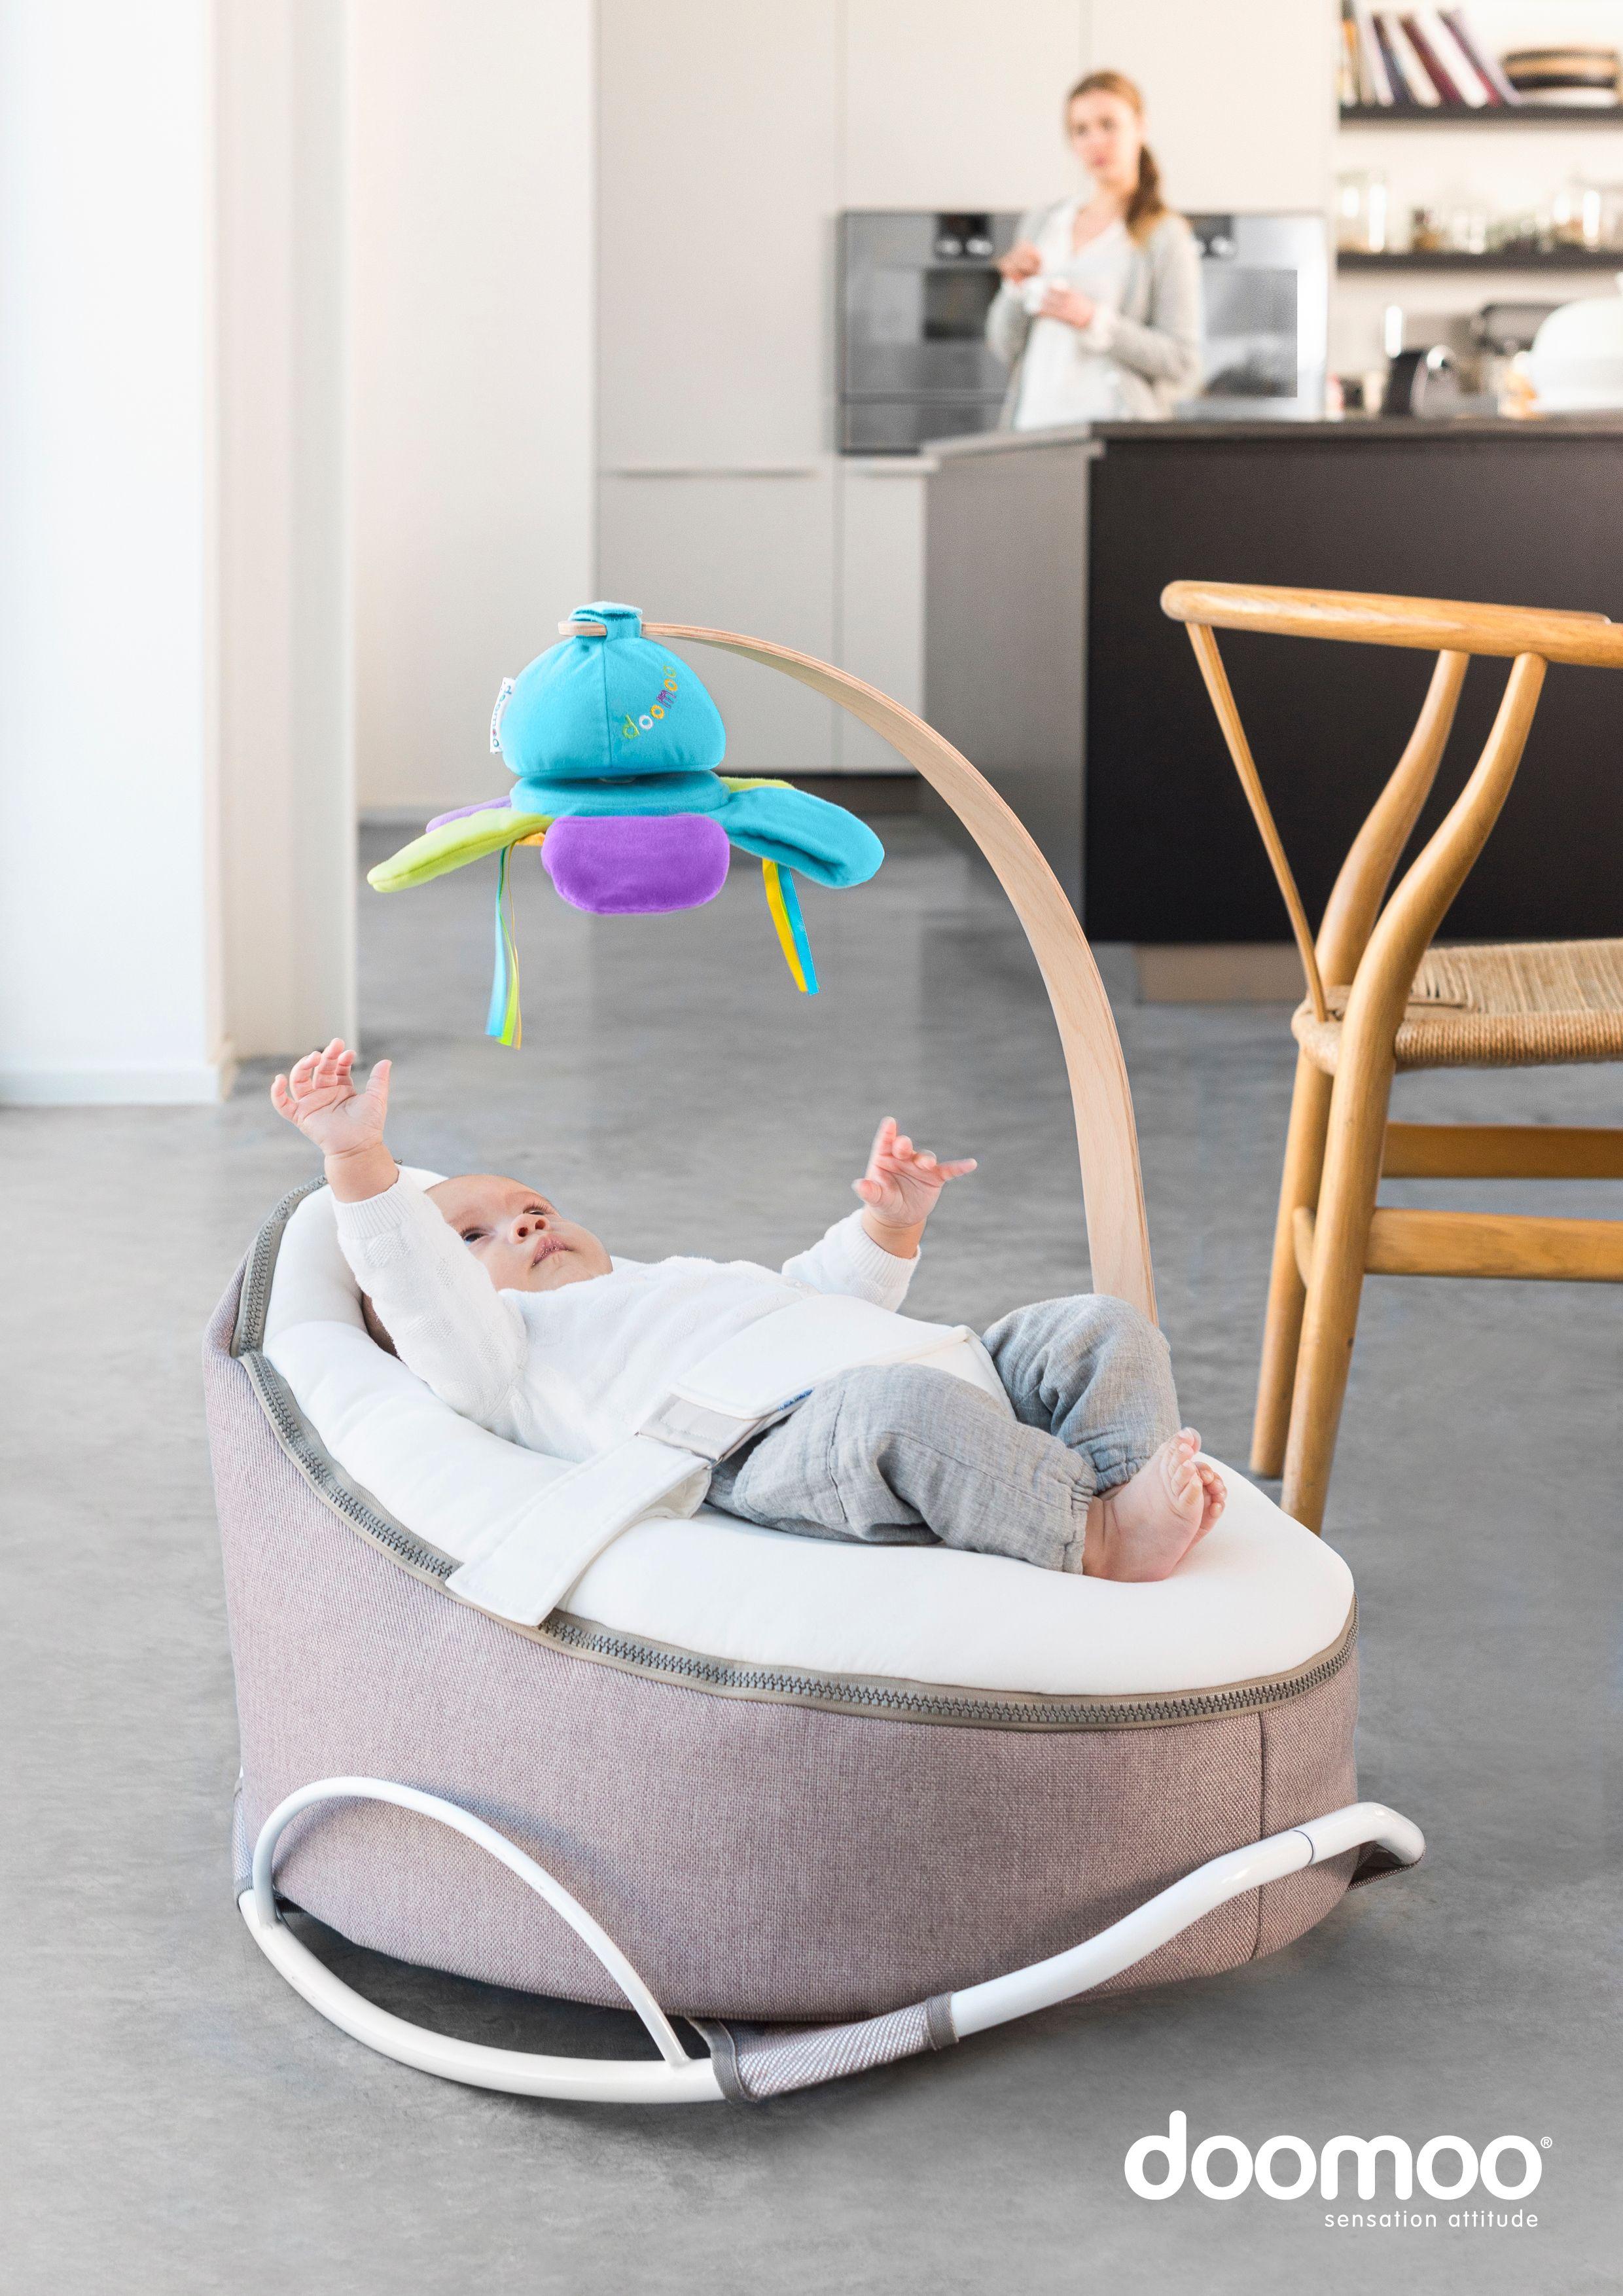 Doomoo Zitzak Lime.Doomoo Arch Swing Bassinet Baby Furniture